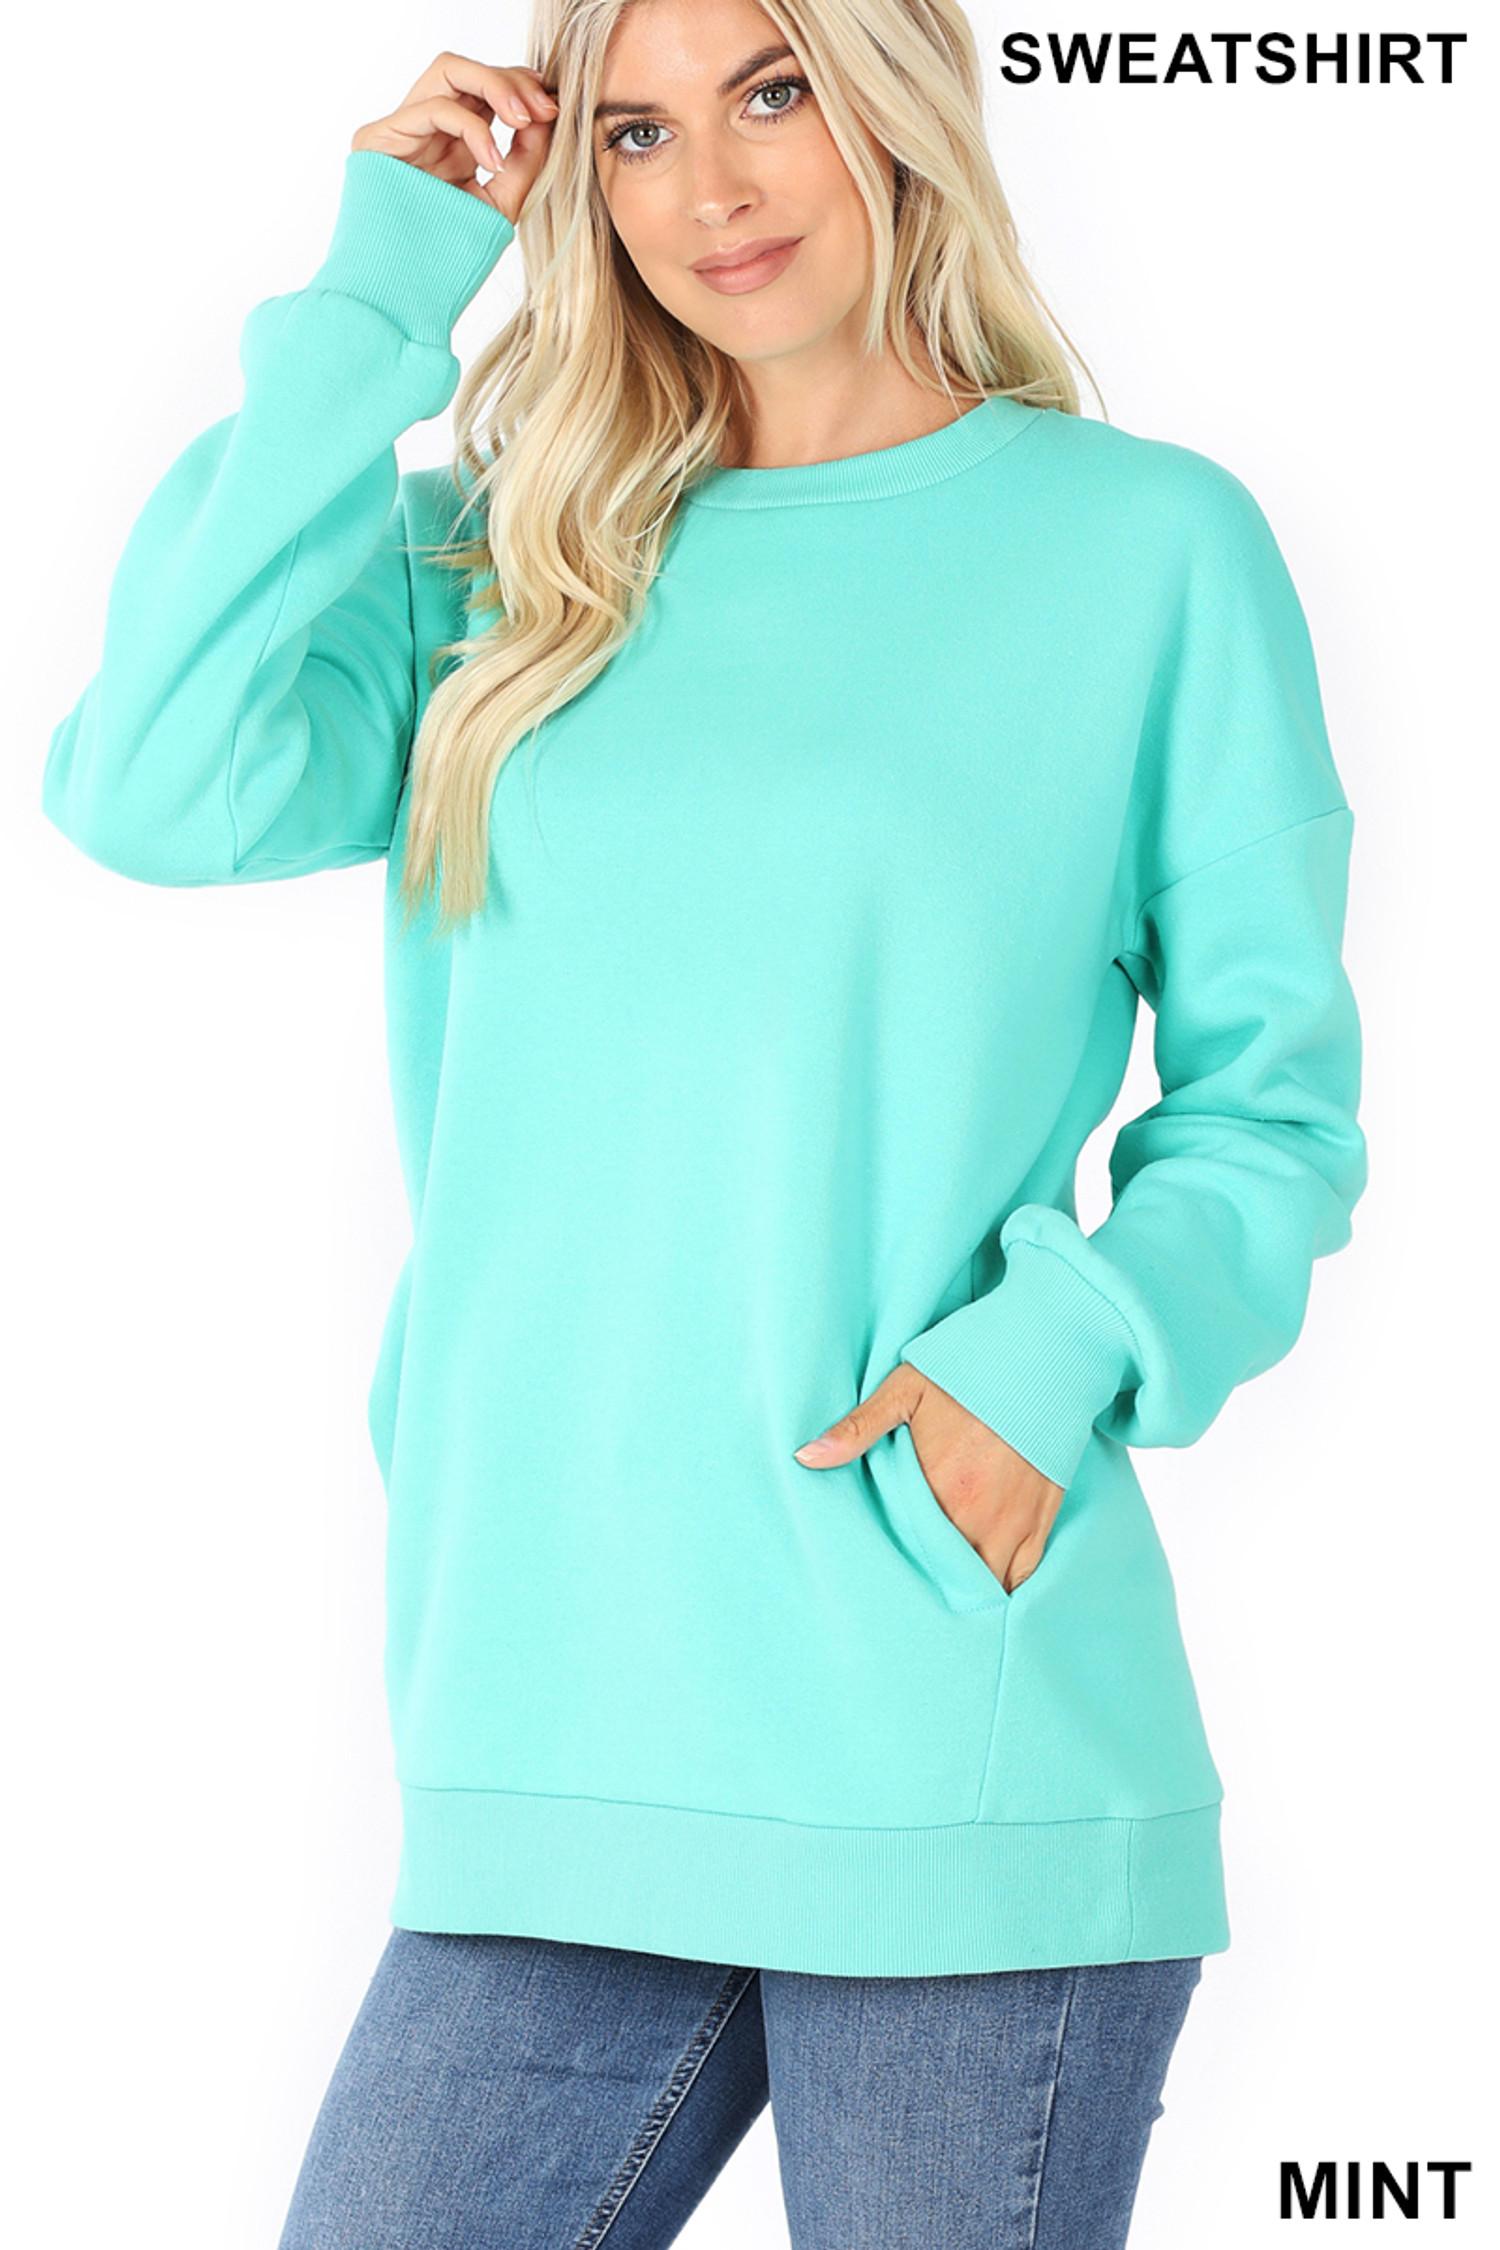 Slightly turned image of Mint Round Crew Neck Sweatshirt with Side Pockets